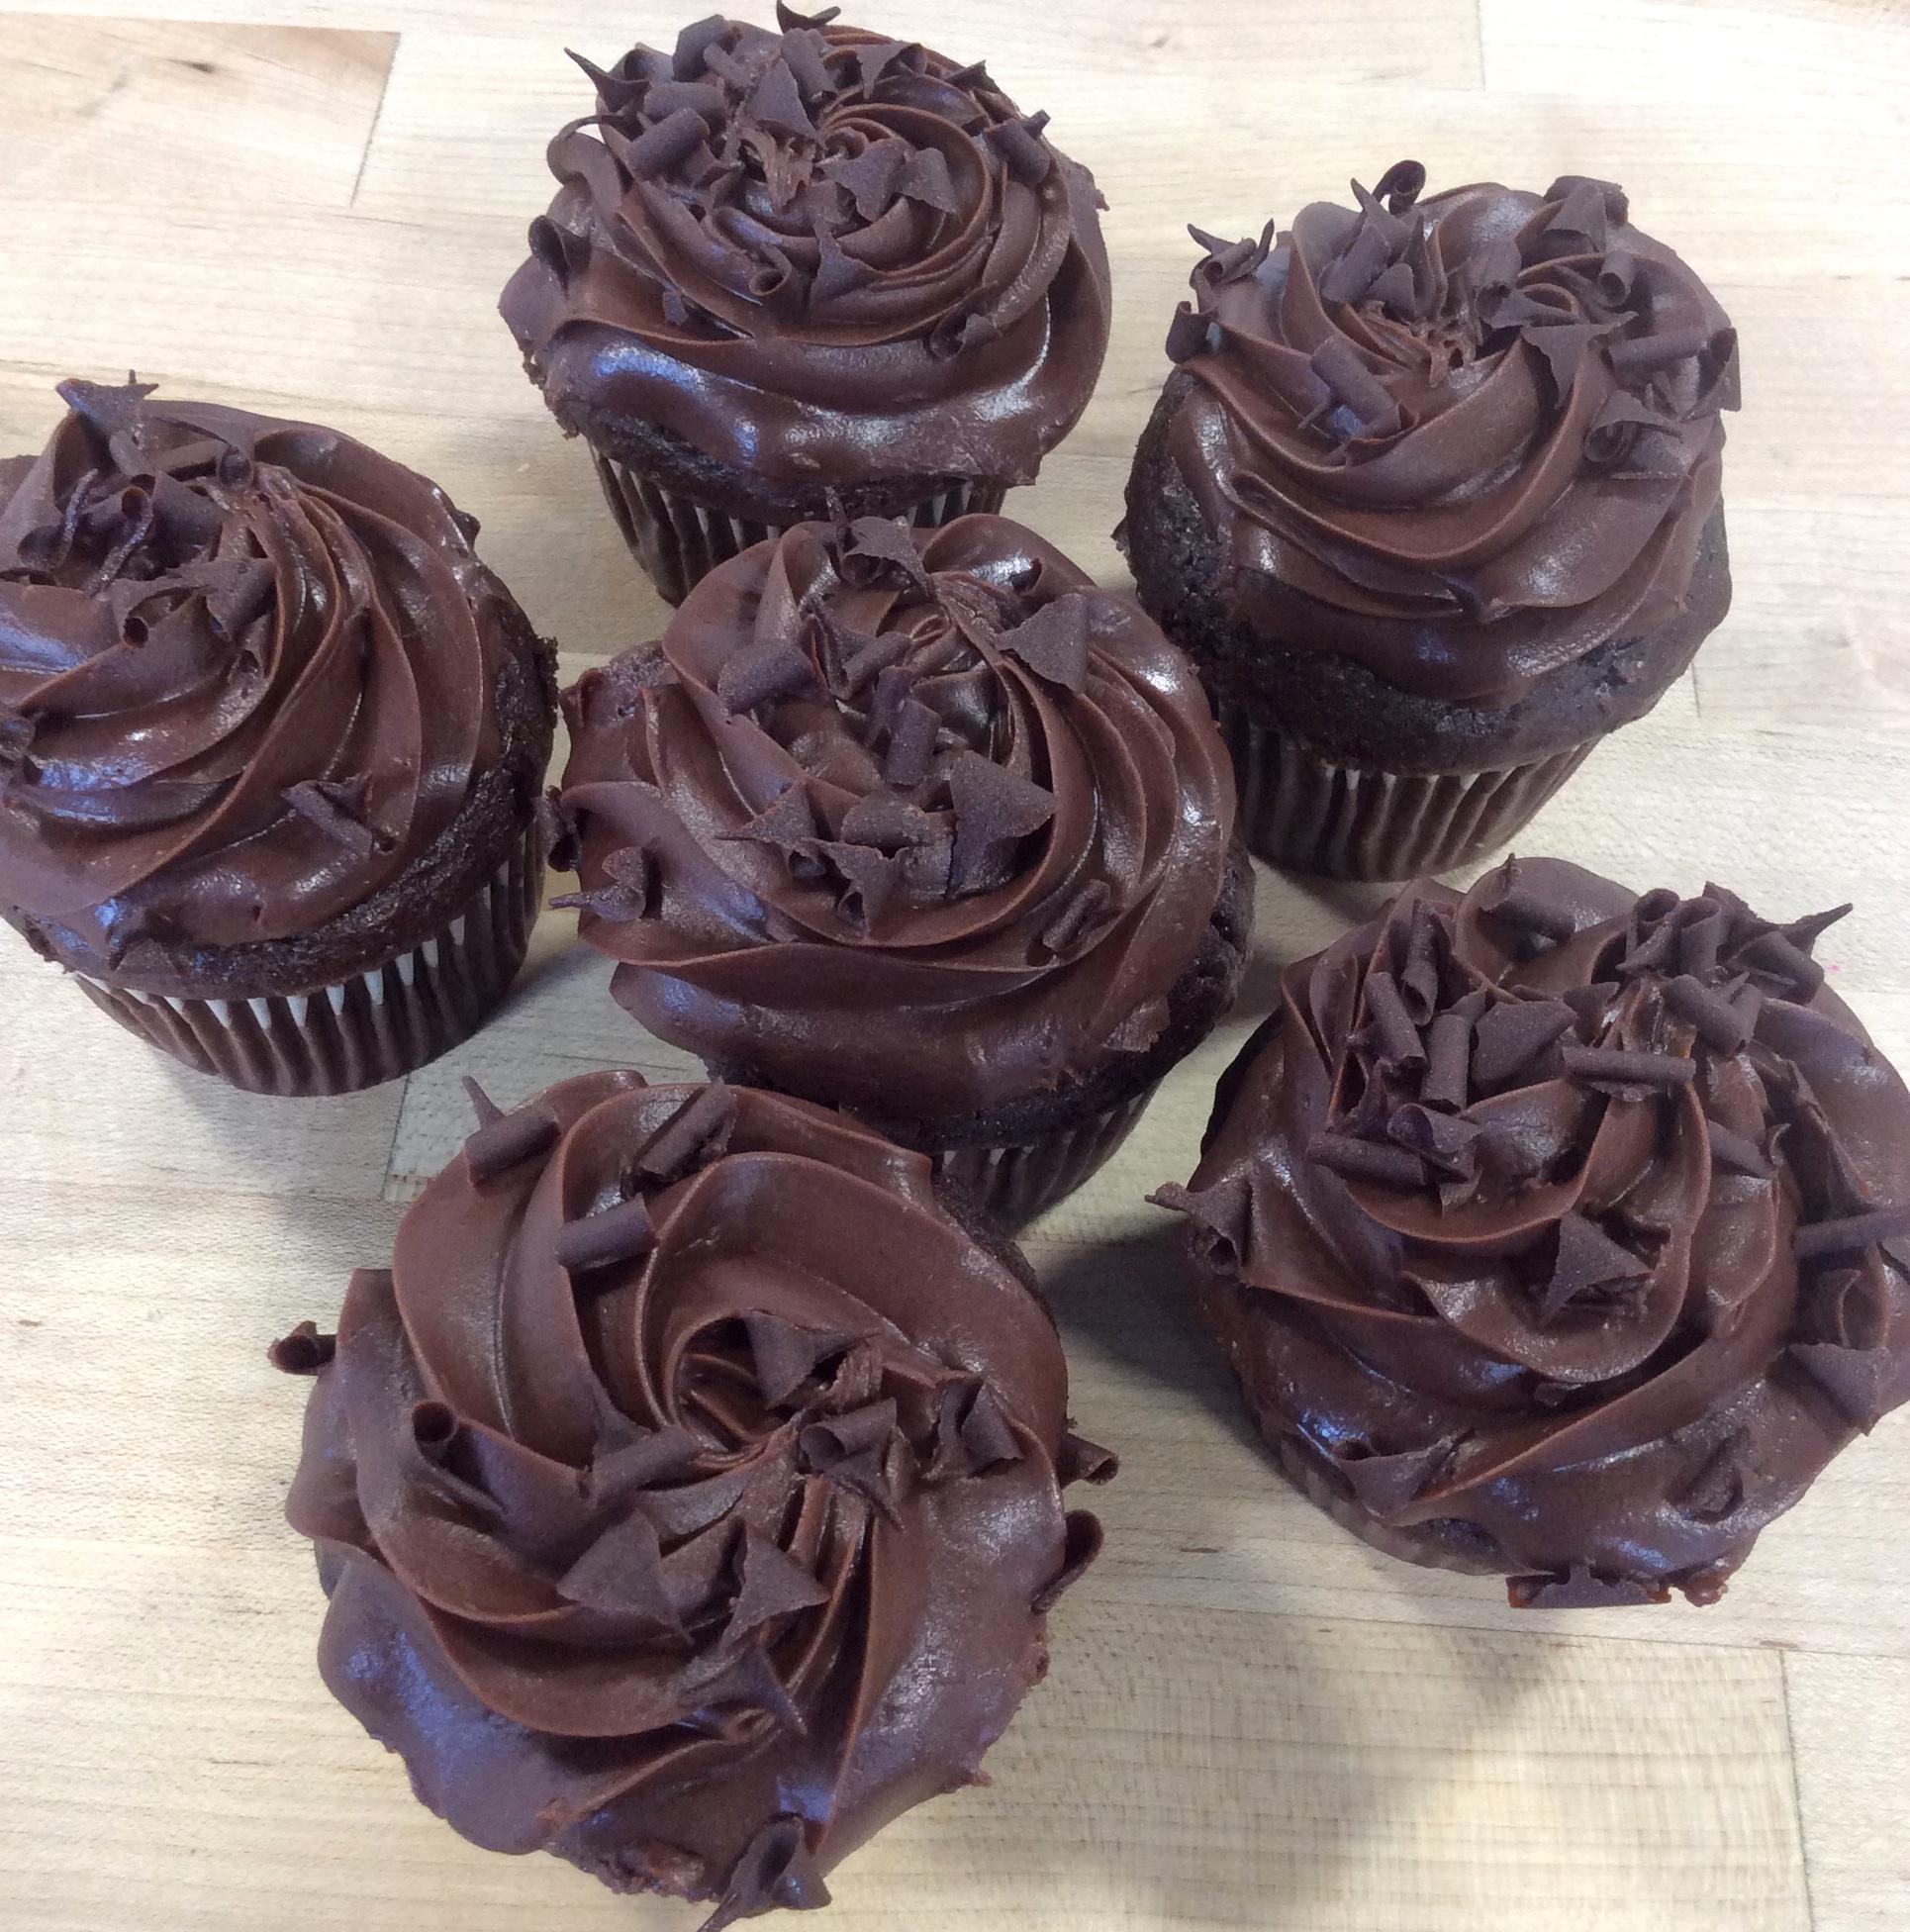 Chocolate Chocolate Pudding Dessert Cupcakes